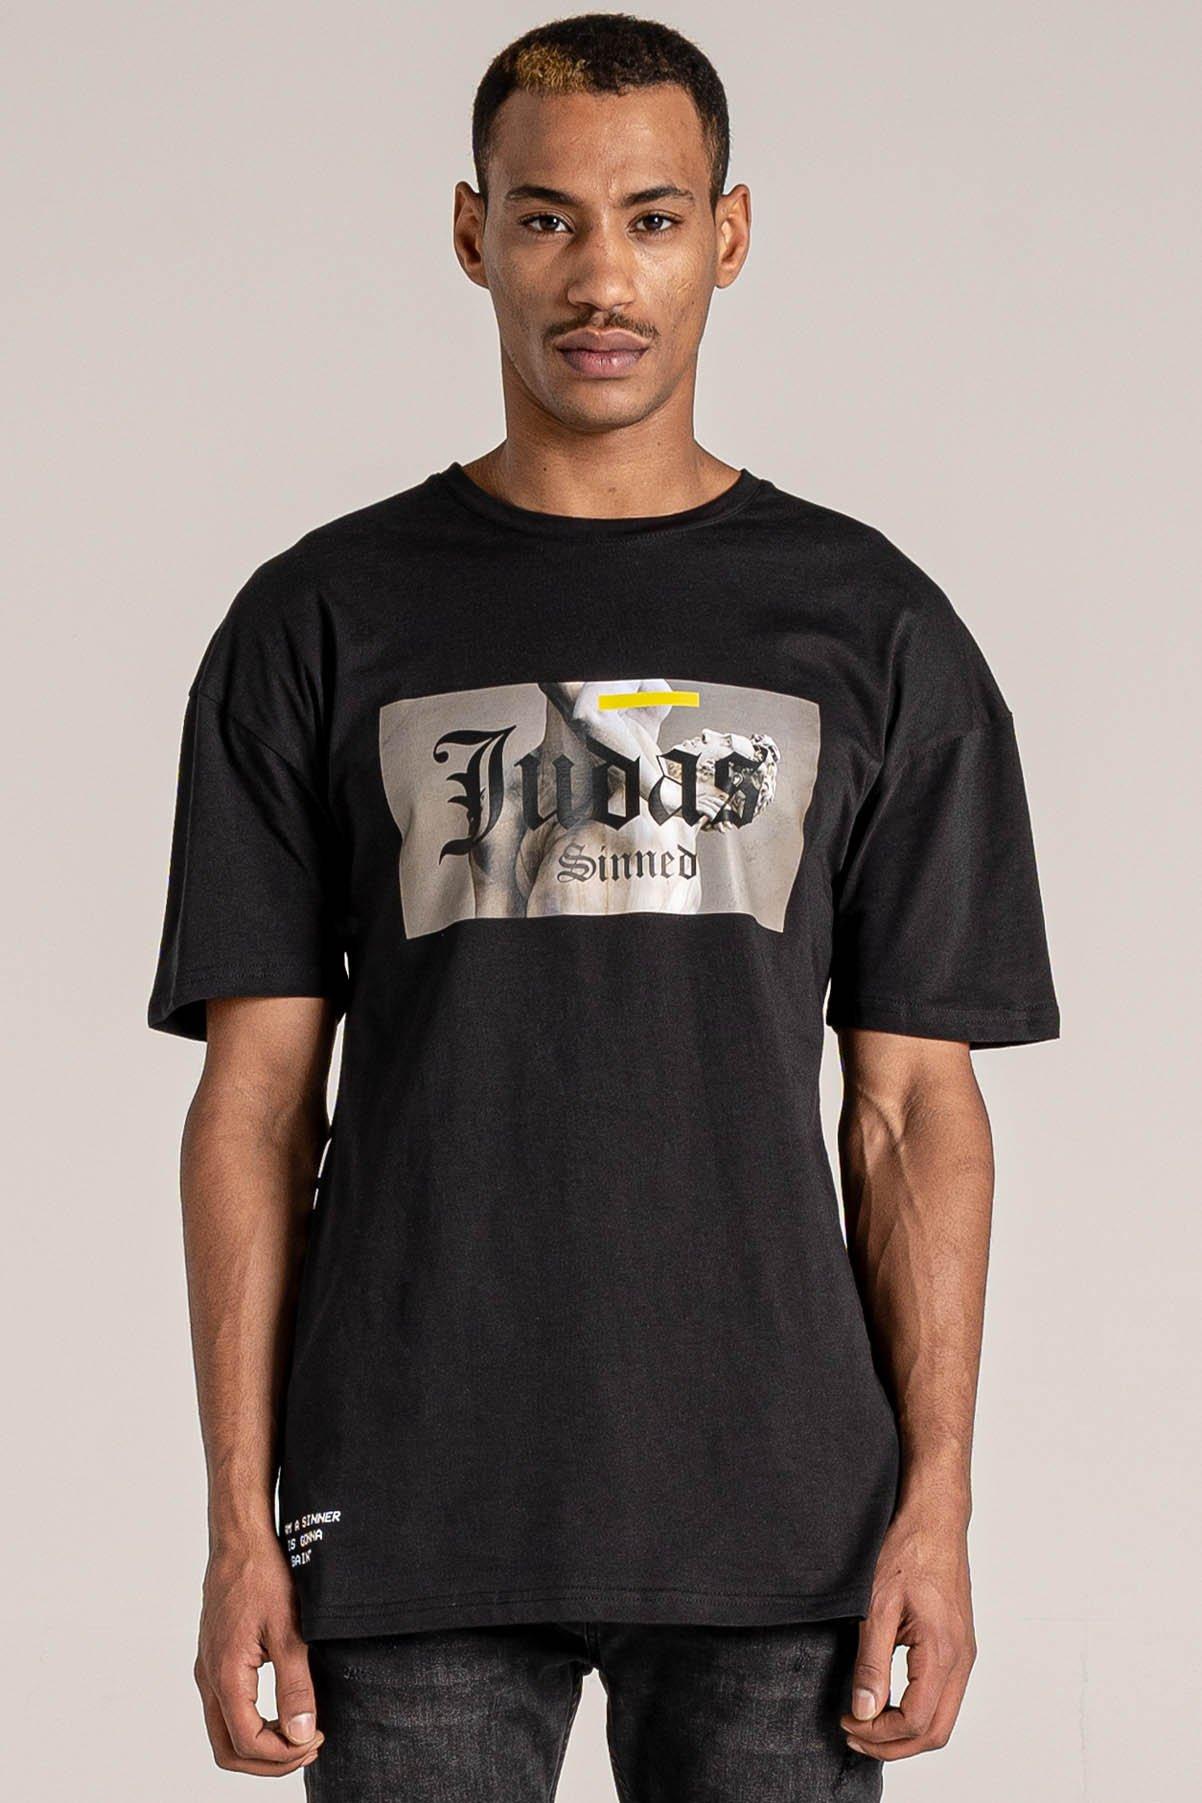 Lift Printed Men's T-Shirt - Black, Small